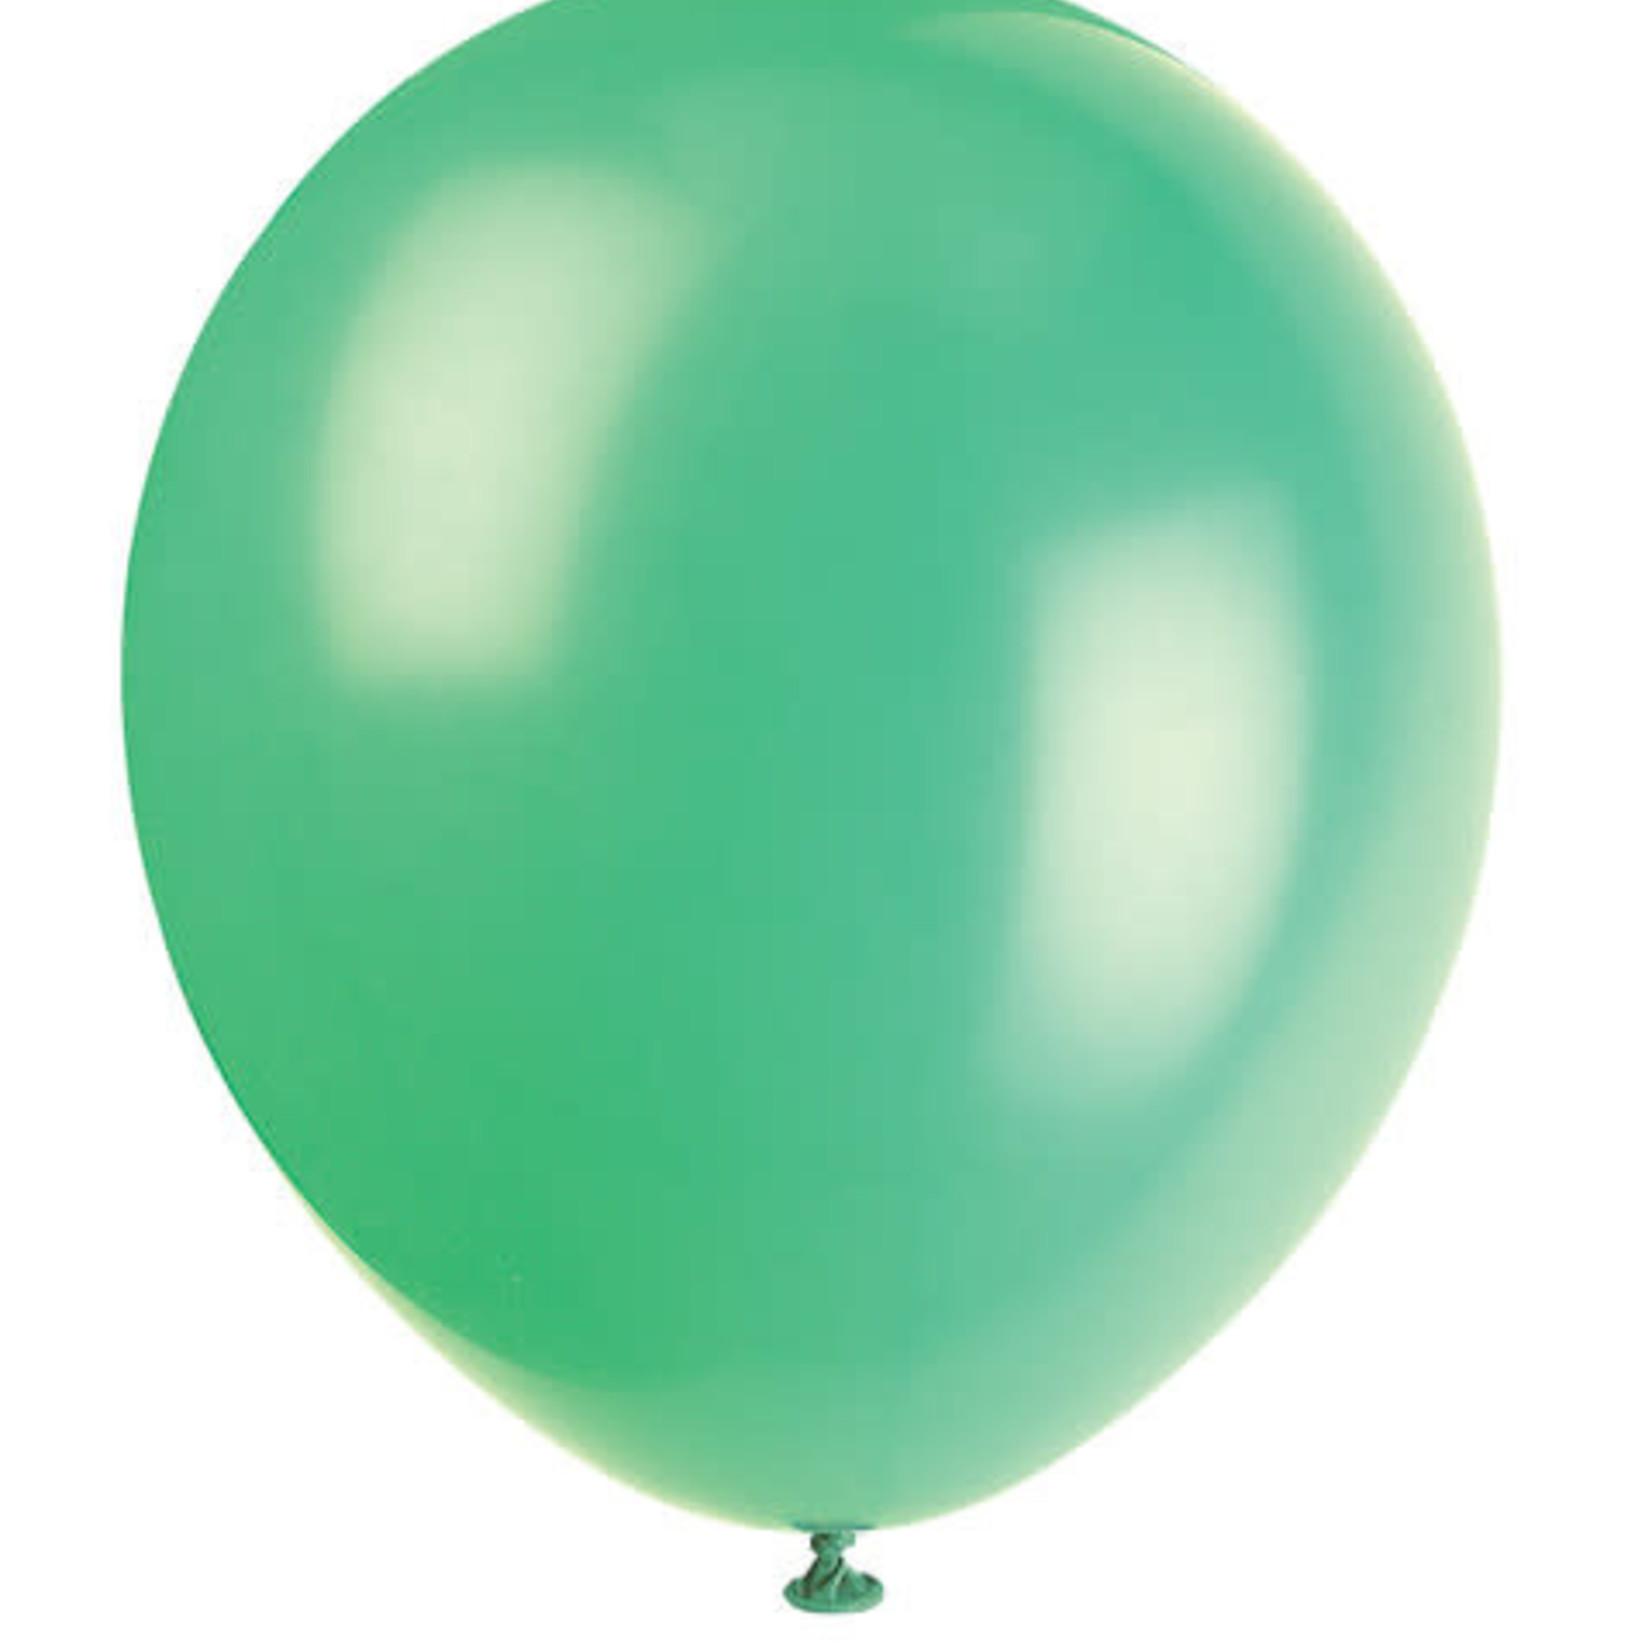 10 12'' EMERALD GREEN BALLOONS